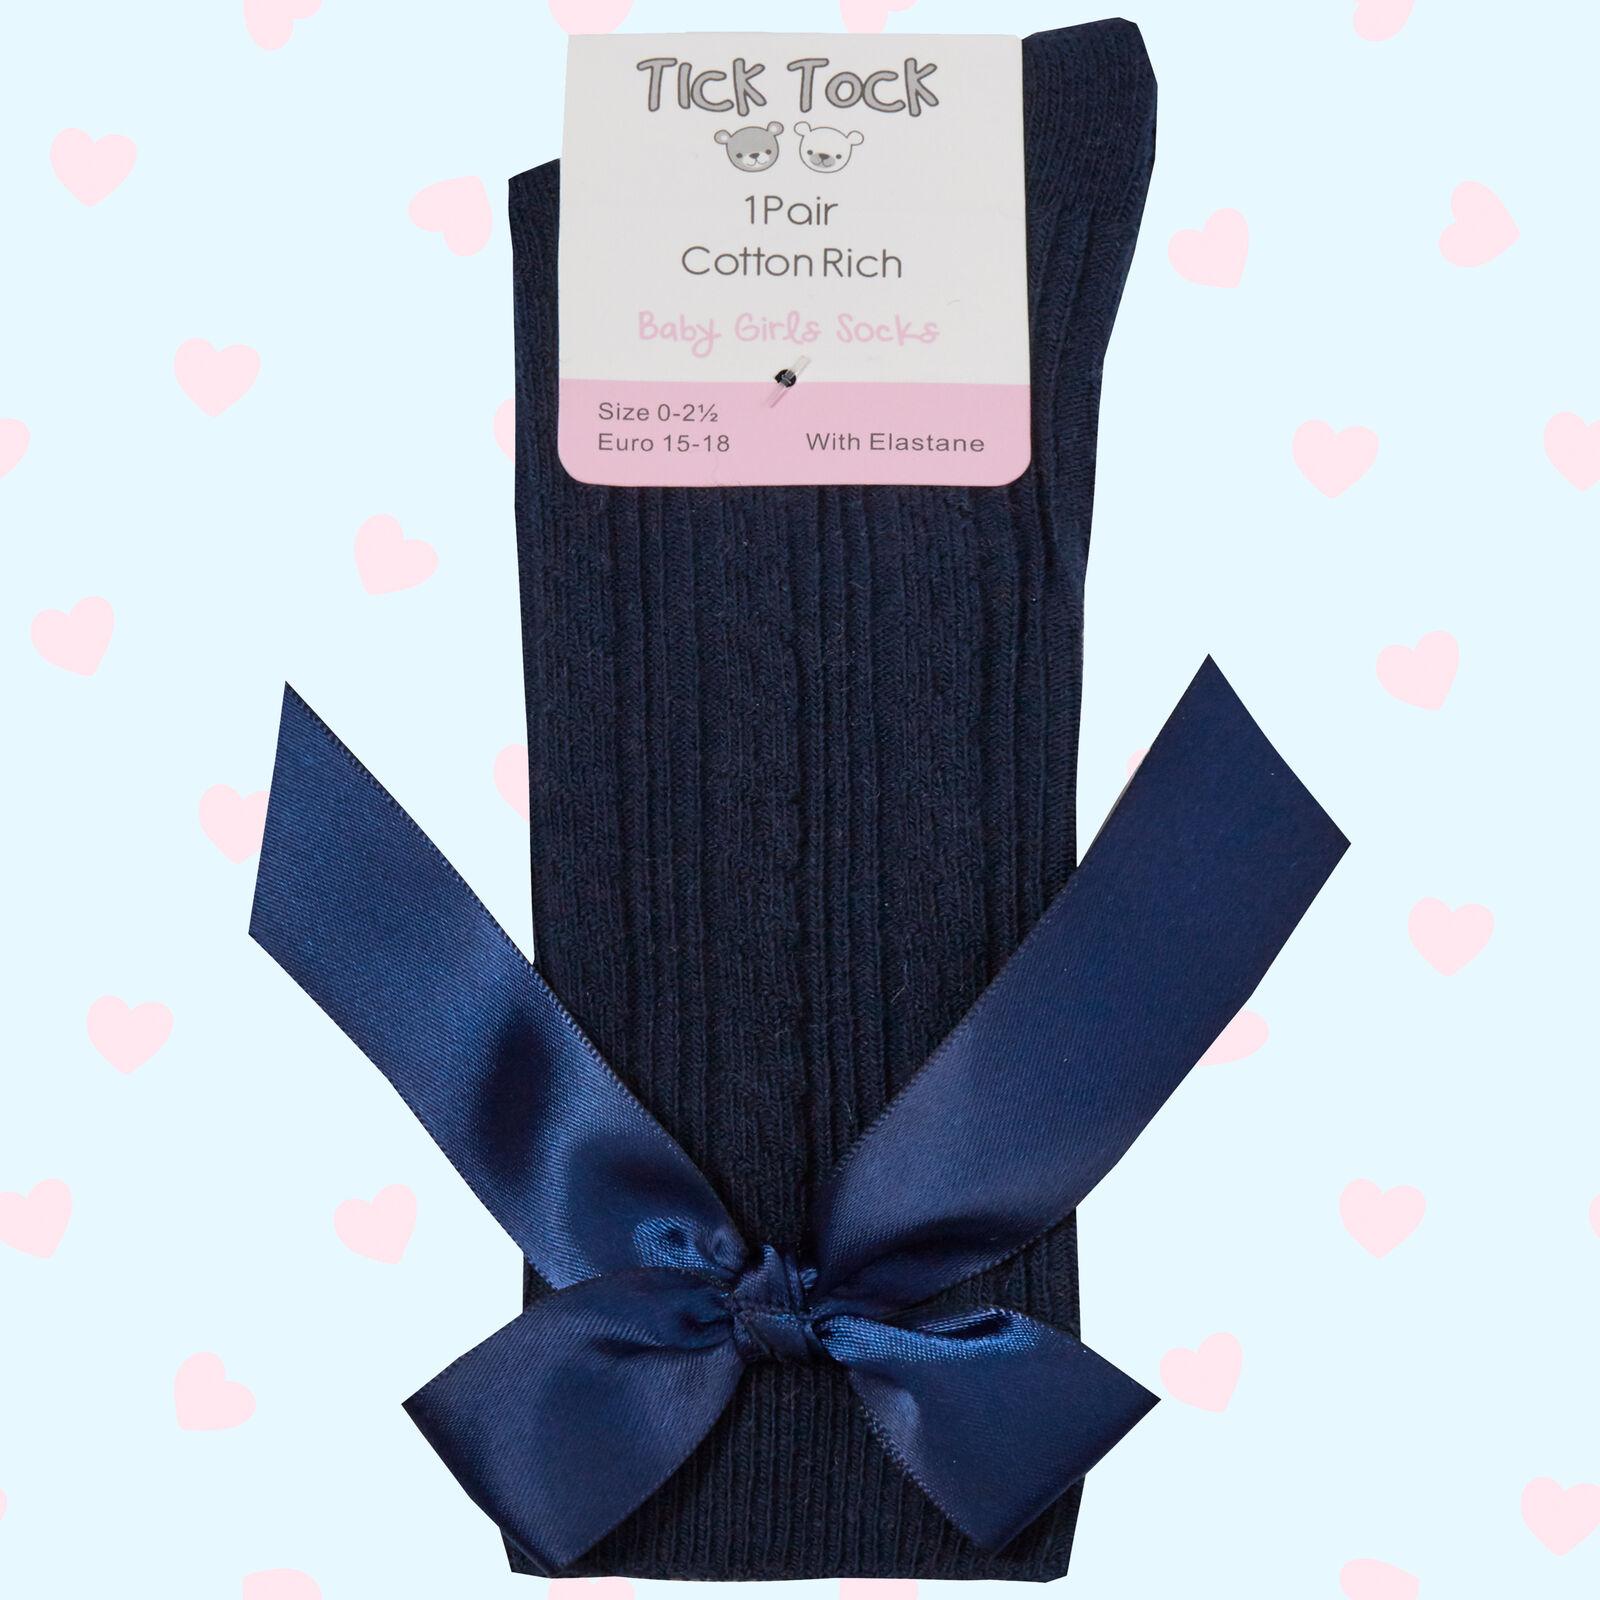 Metzuyan Baby Girls Stocking High Knee Long Socks with Bows